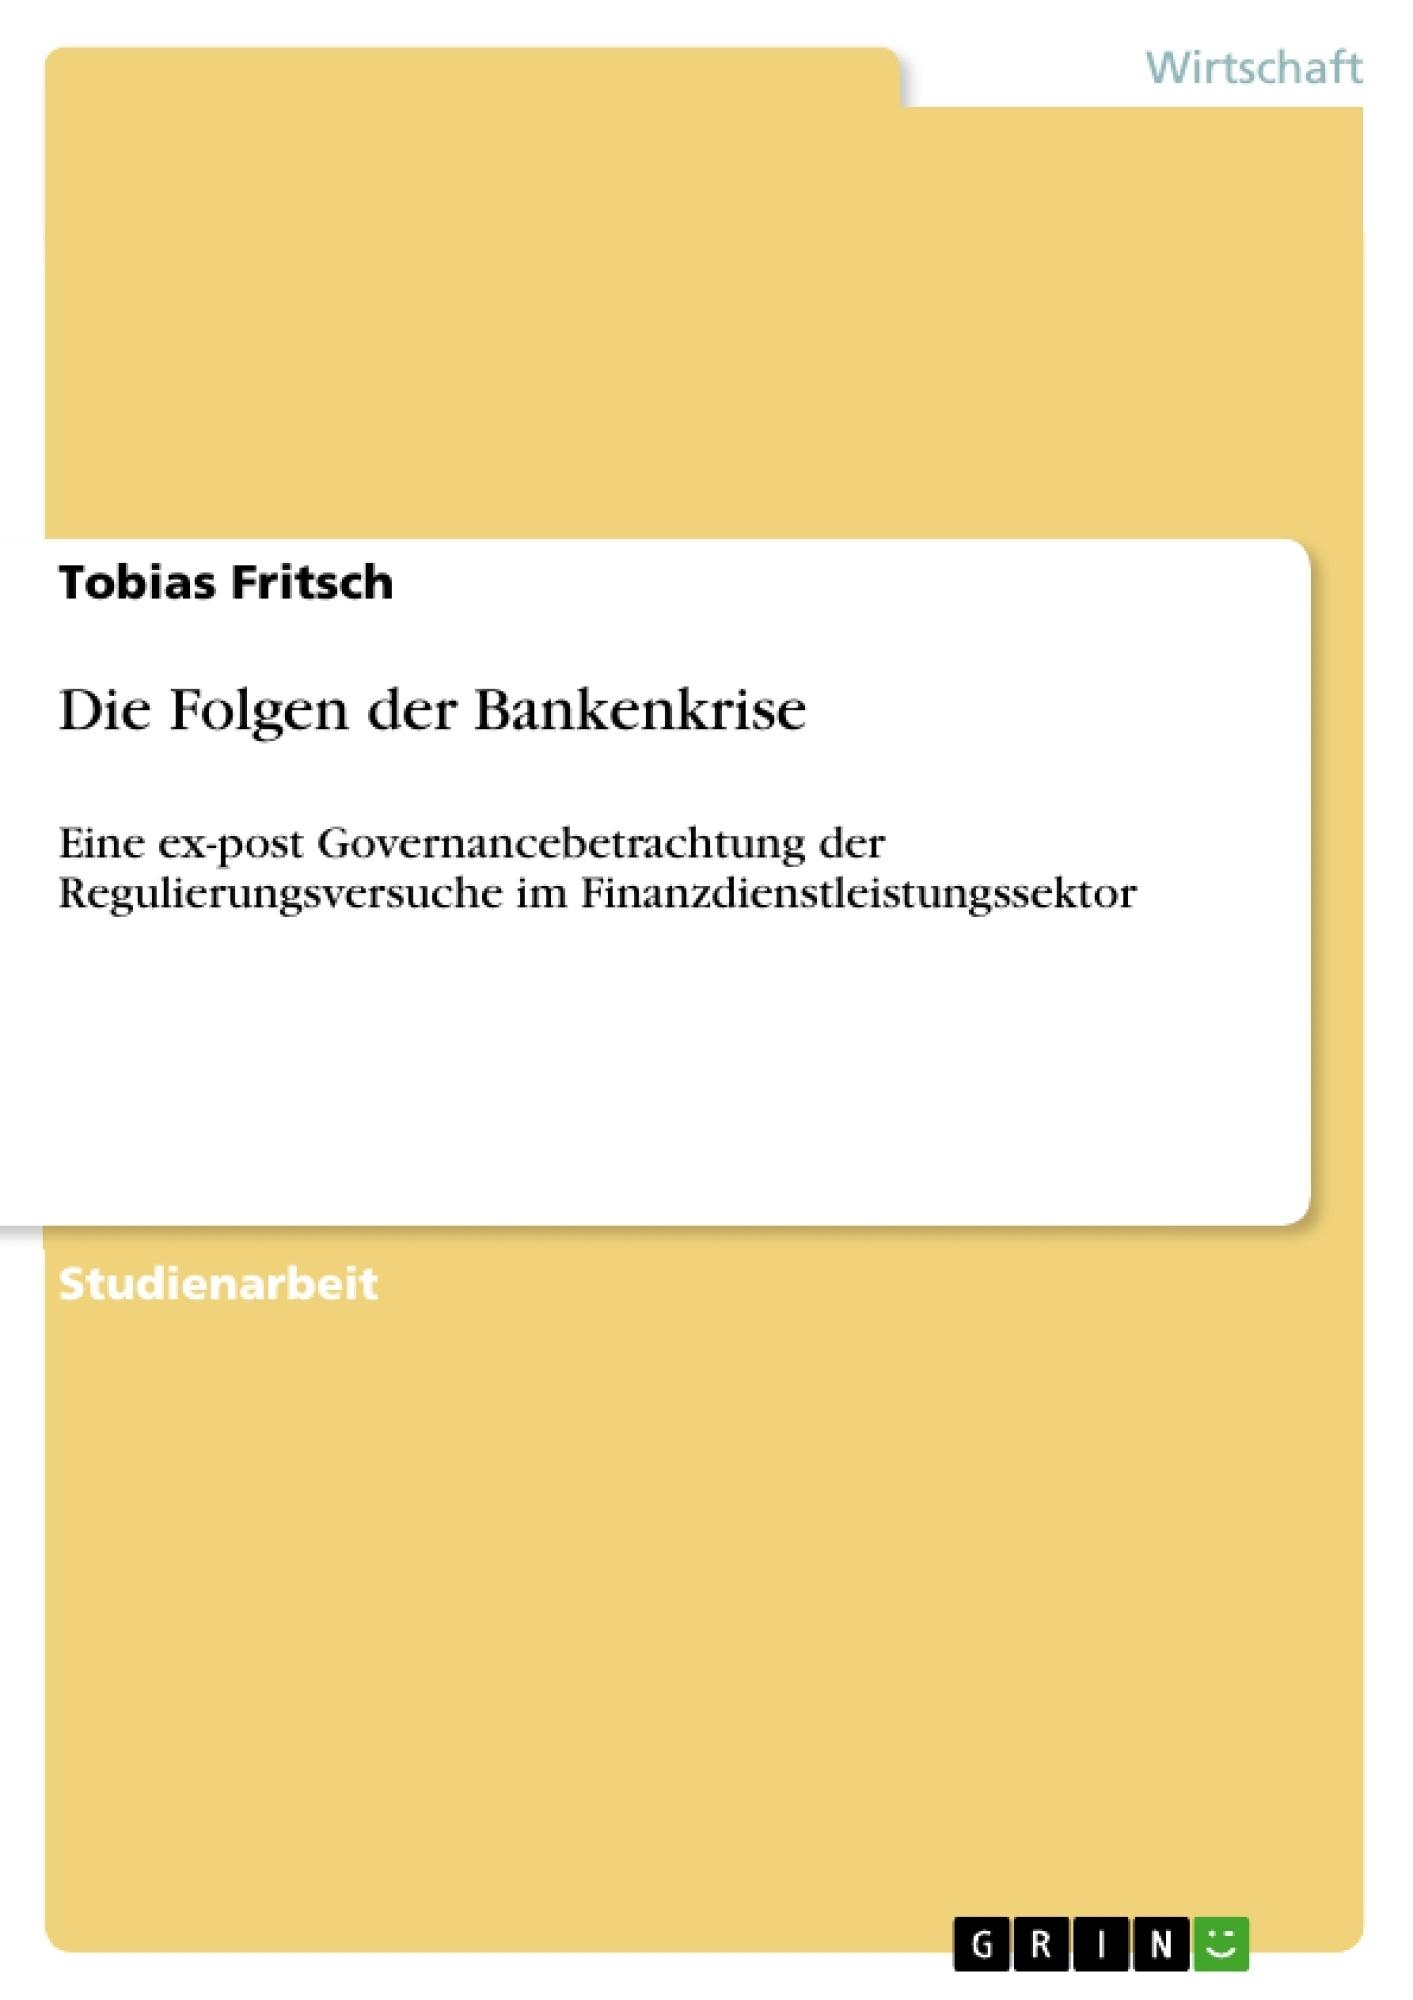 Titel: Die Folgen der Bankenkrise